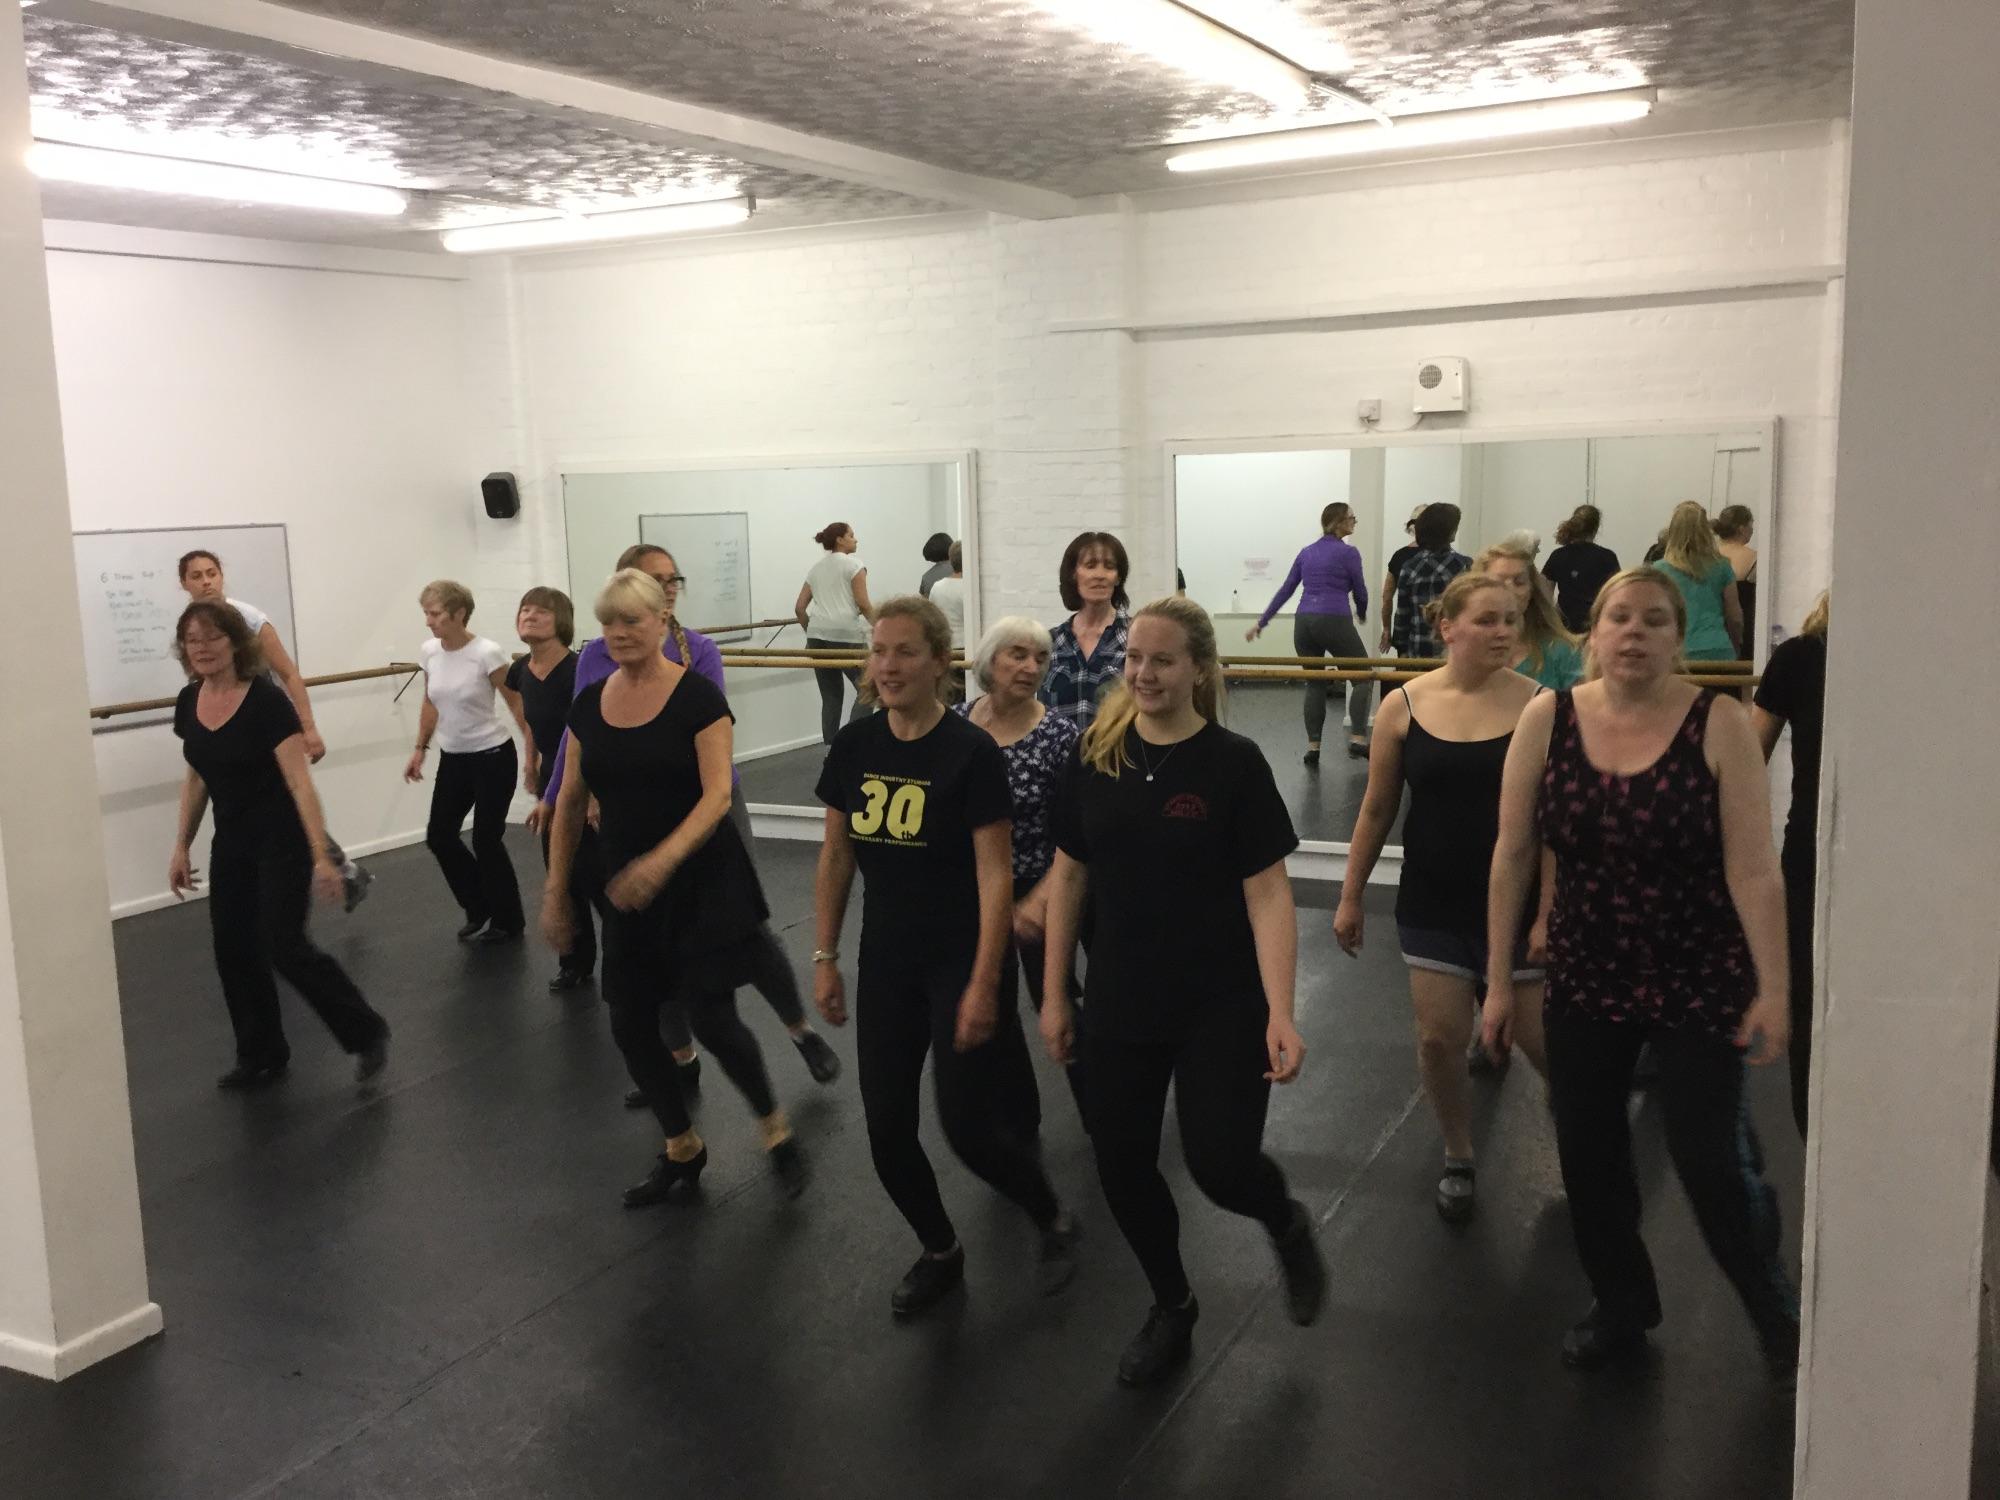 Adult tap dance